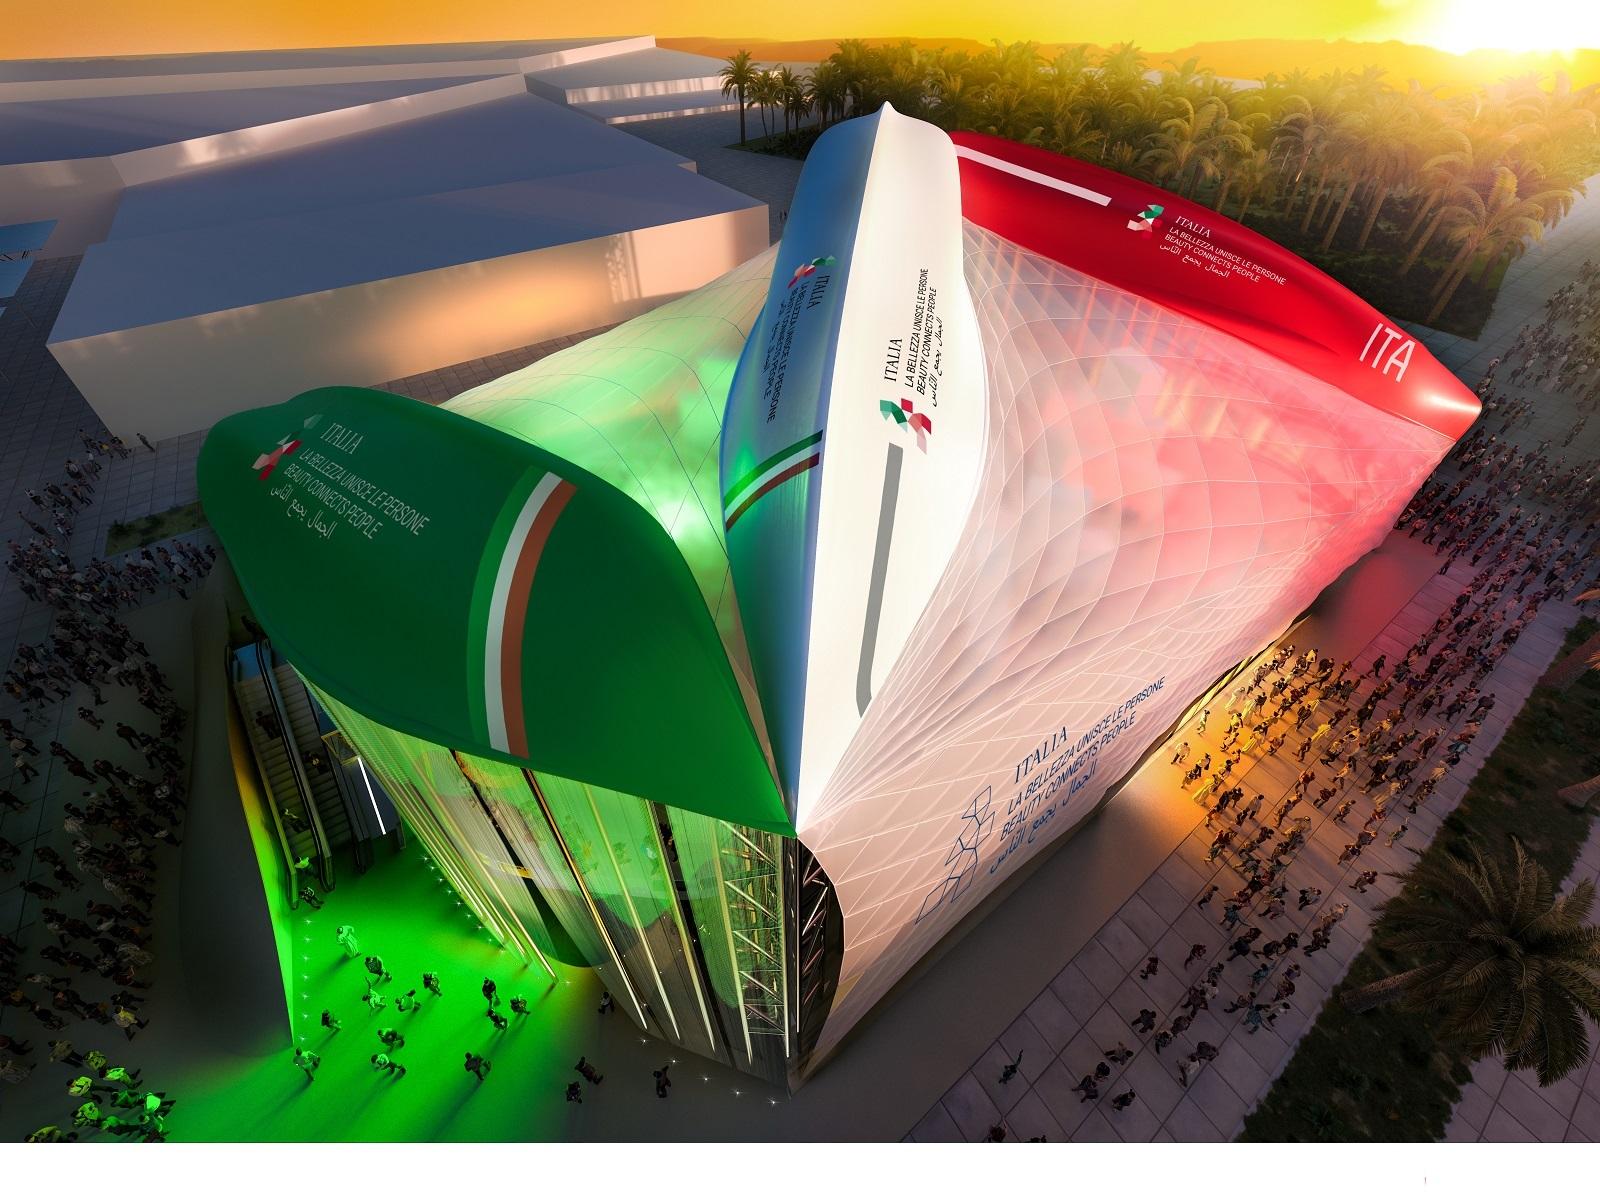 Padiglione Italia EXPO 2020 Dubai